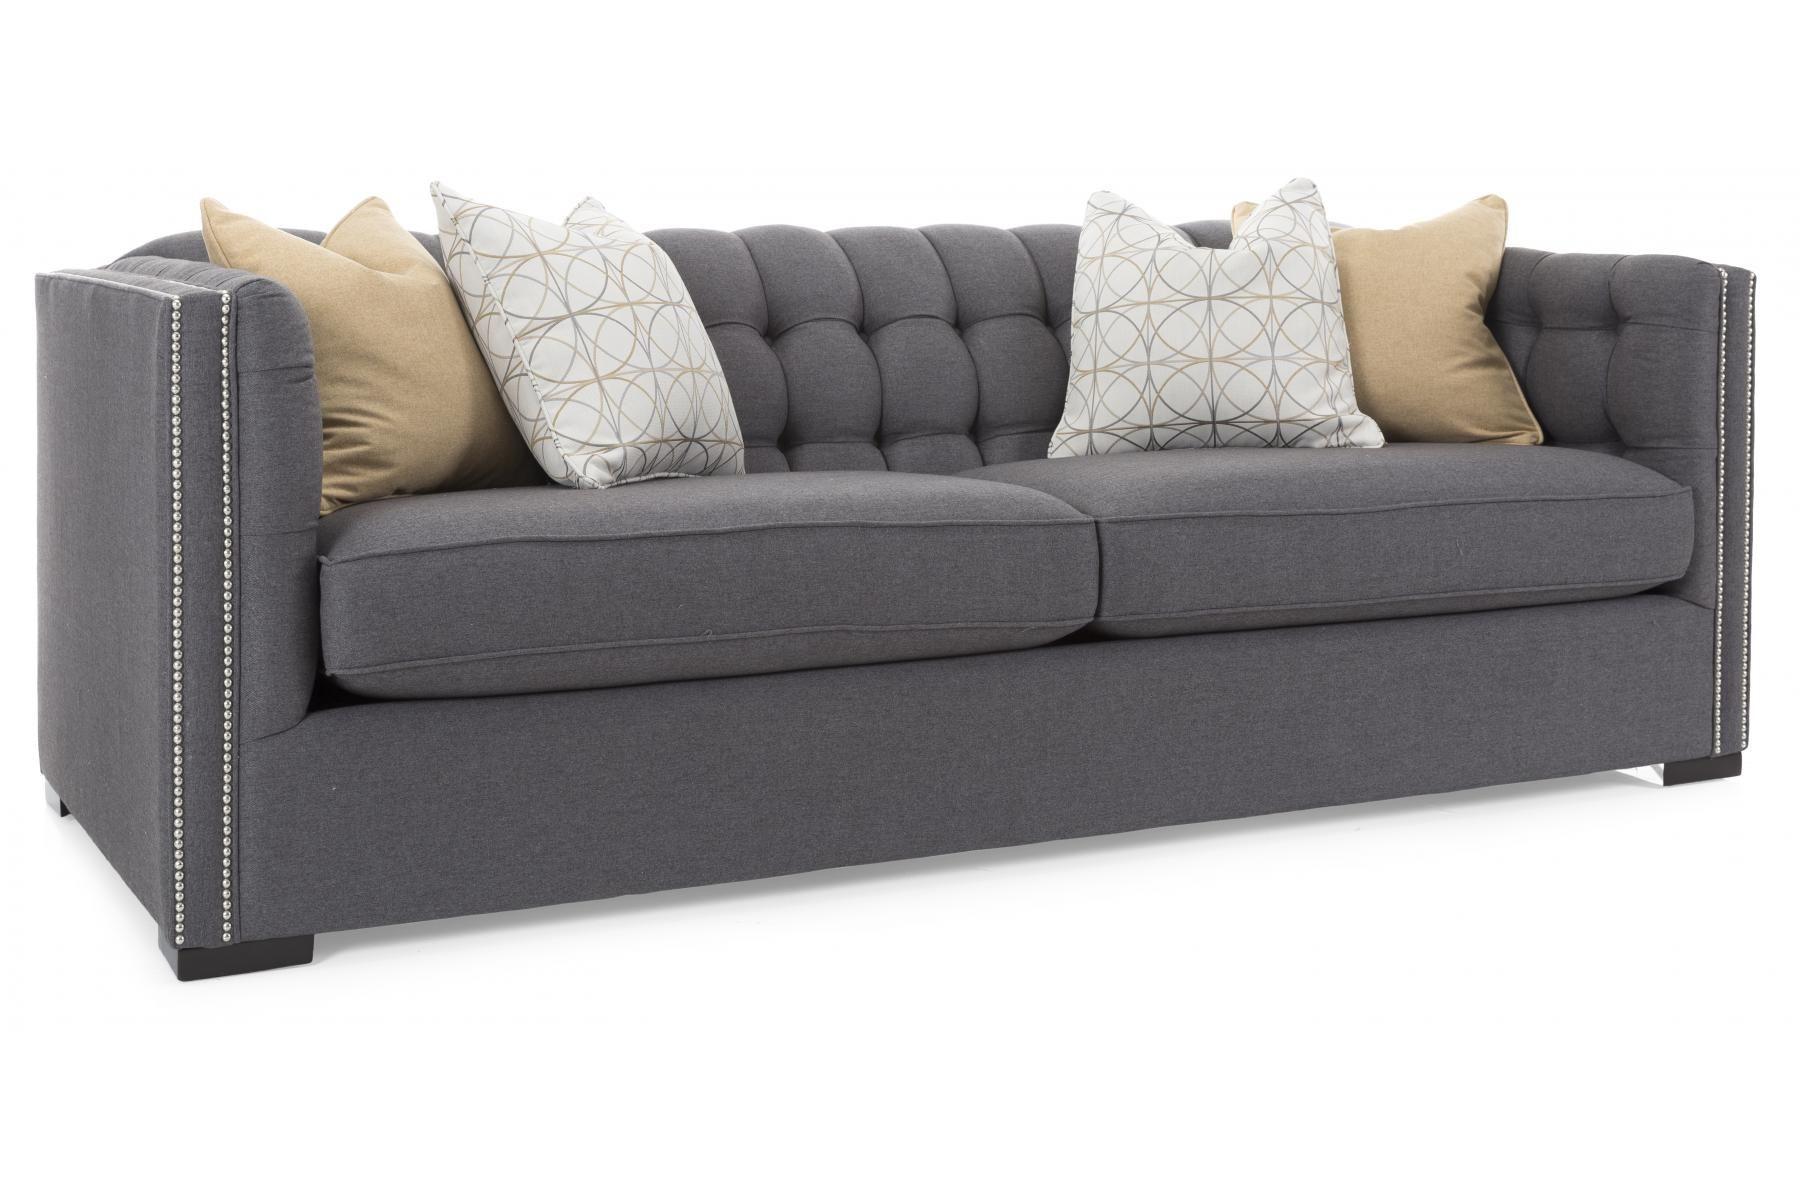 Violino Sofa Gallery1 Furniture Love Seat Sofas Sofa